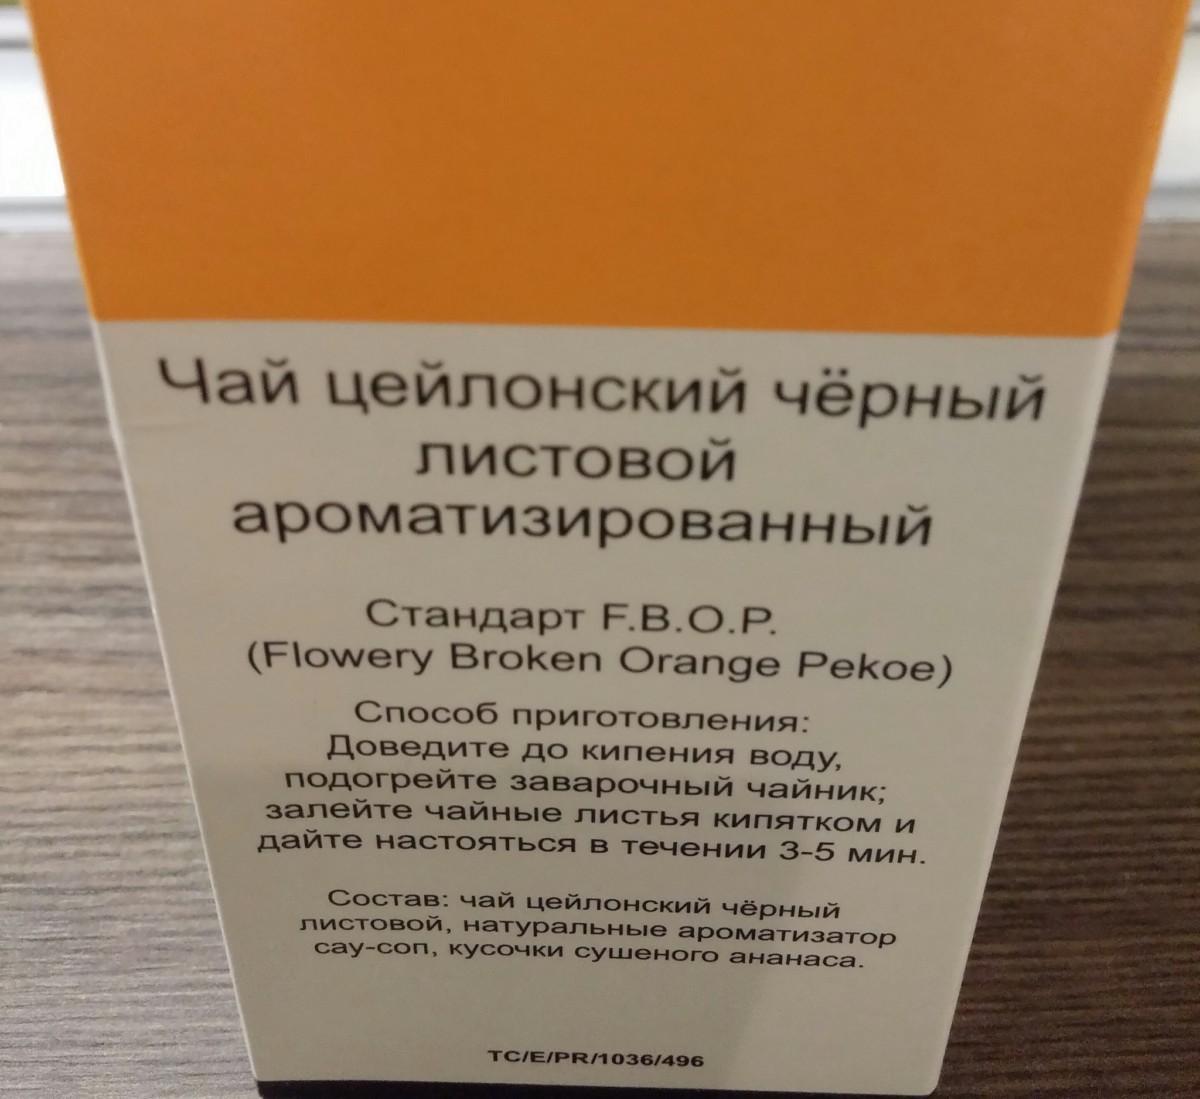 Флауэри Брокен Оранж Пеко